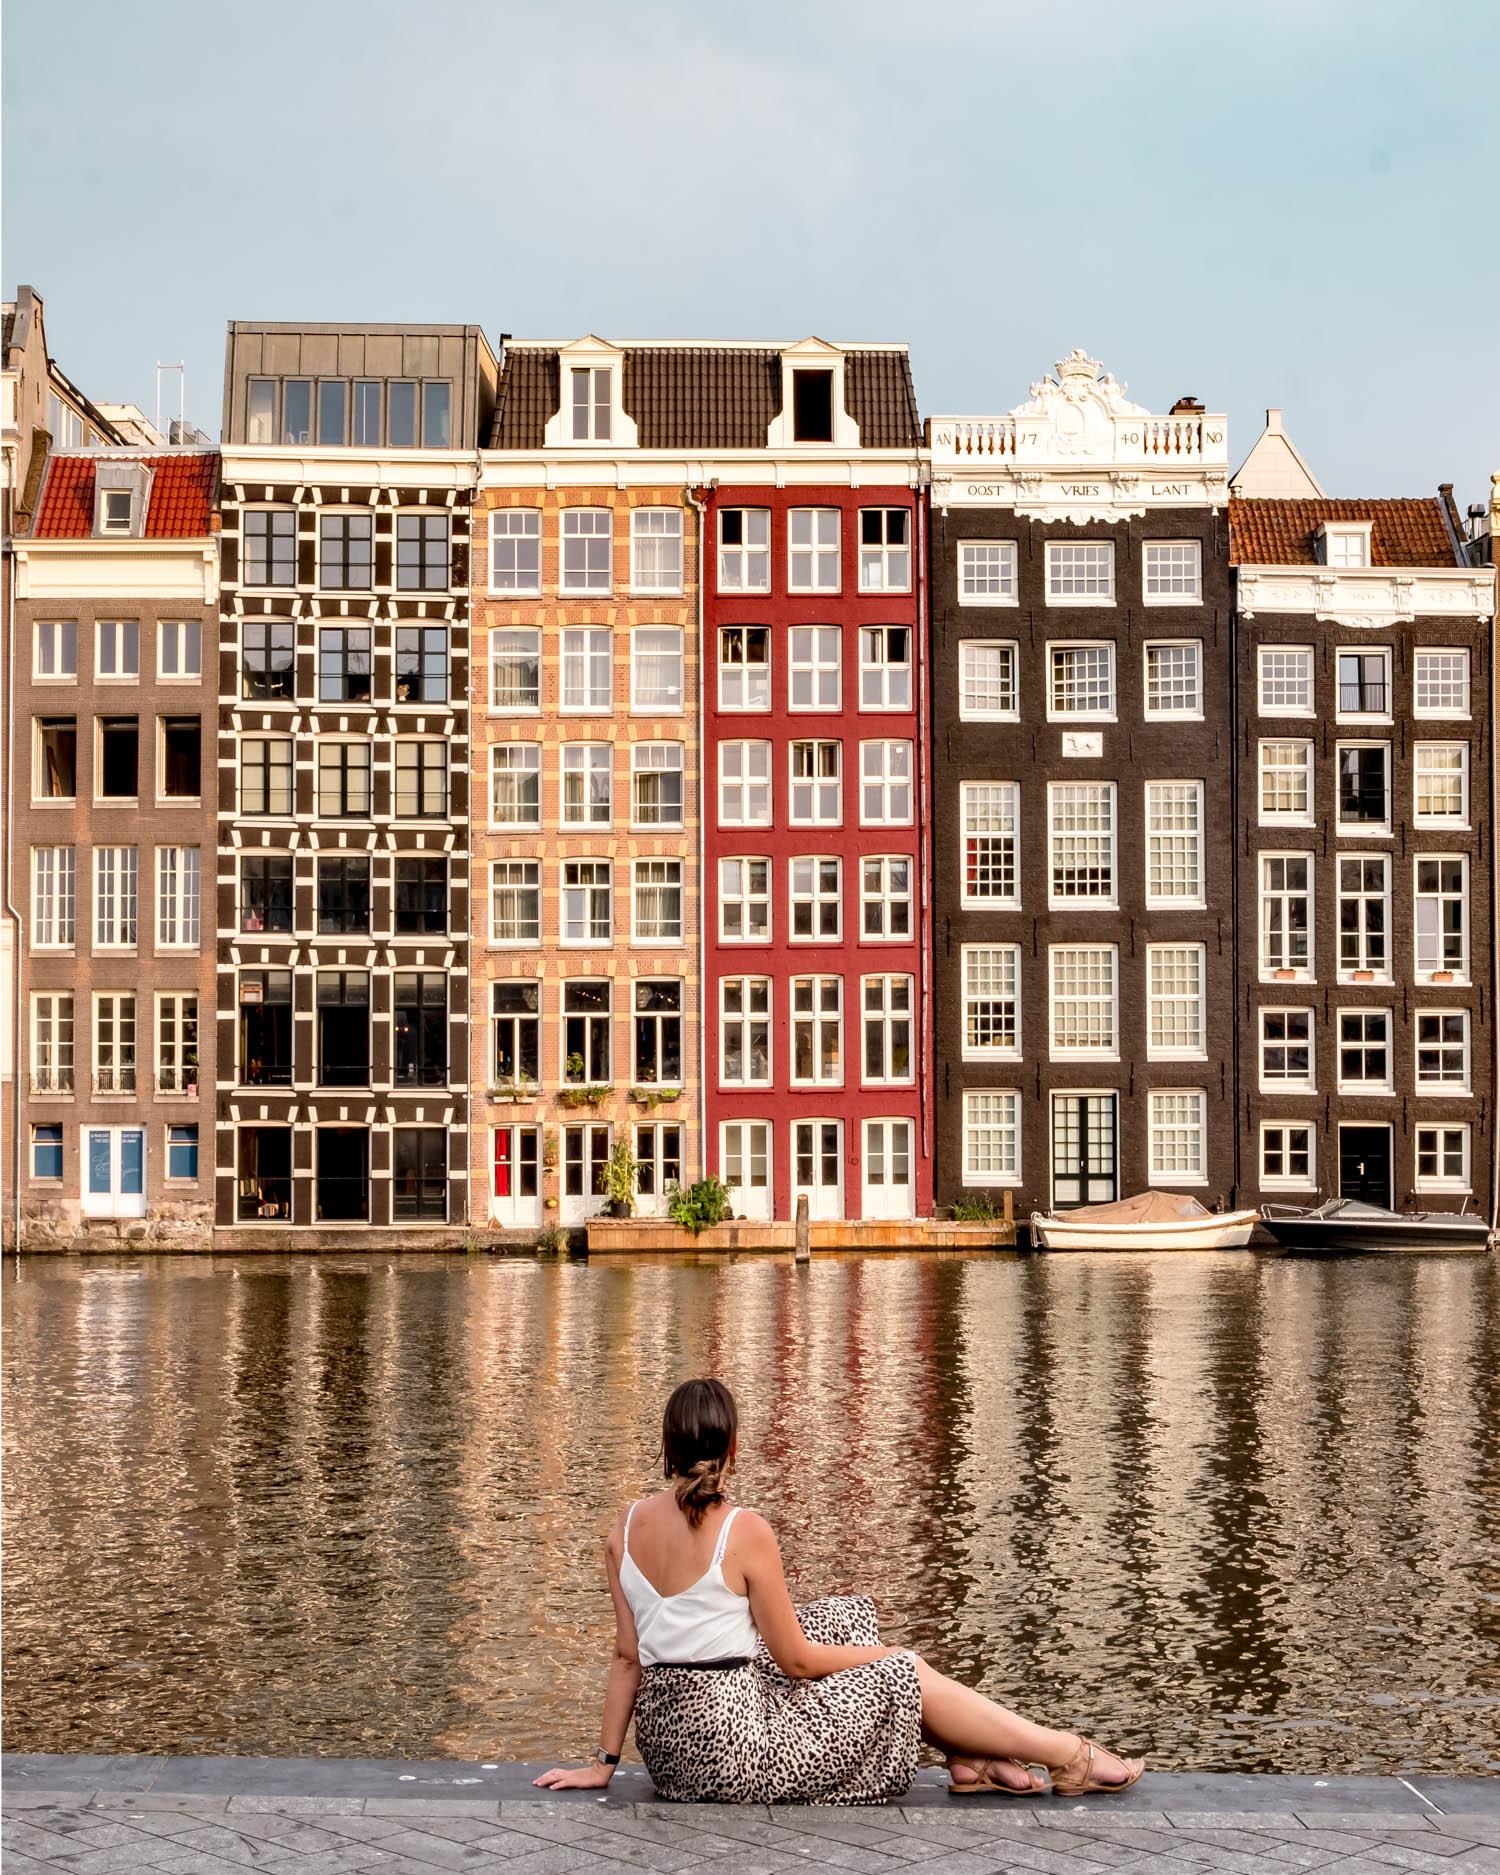 2 days in Amsterdam Damrak houses